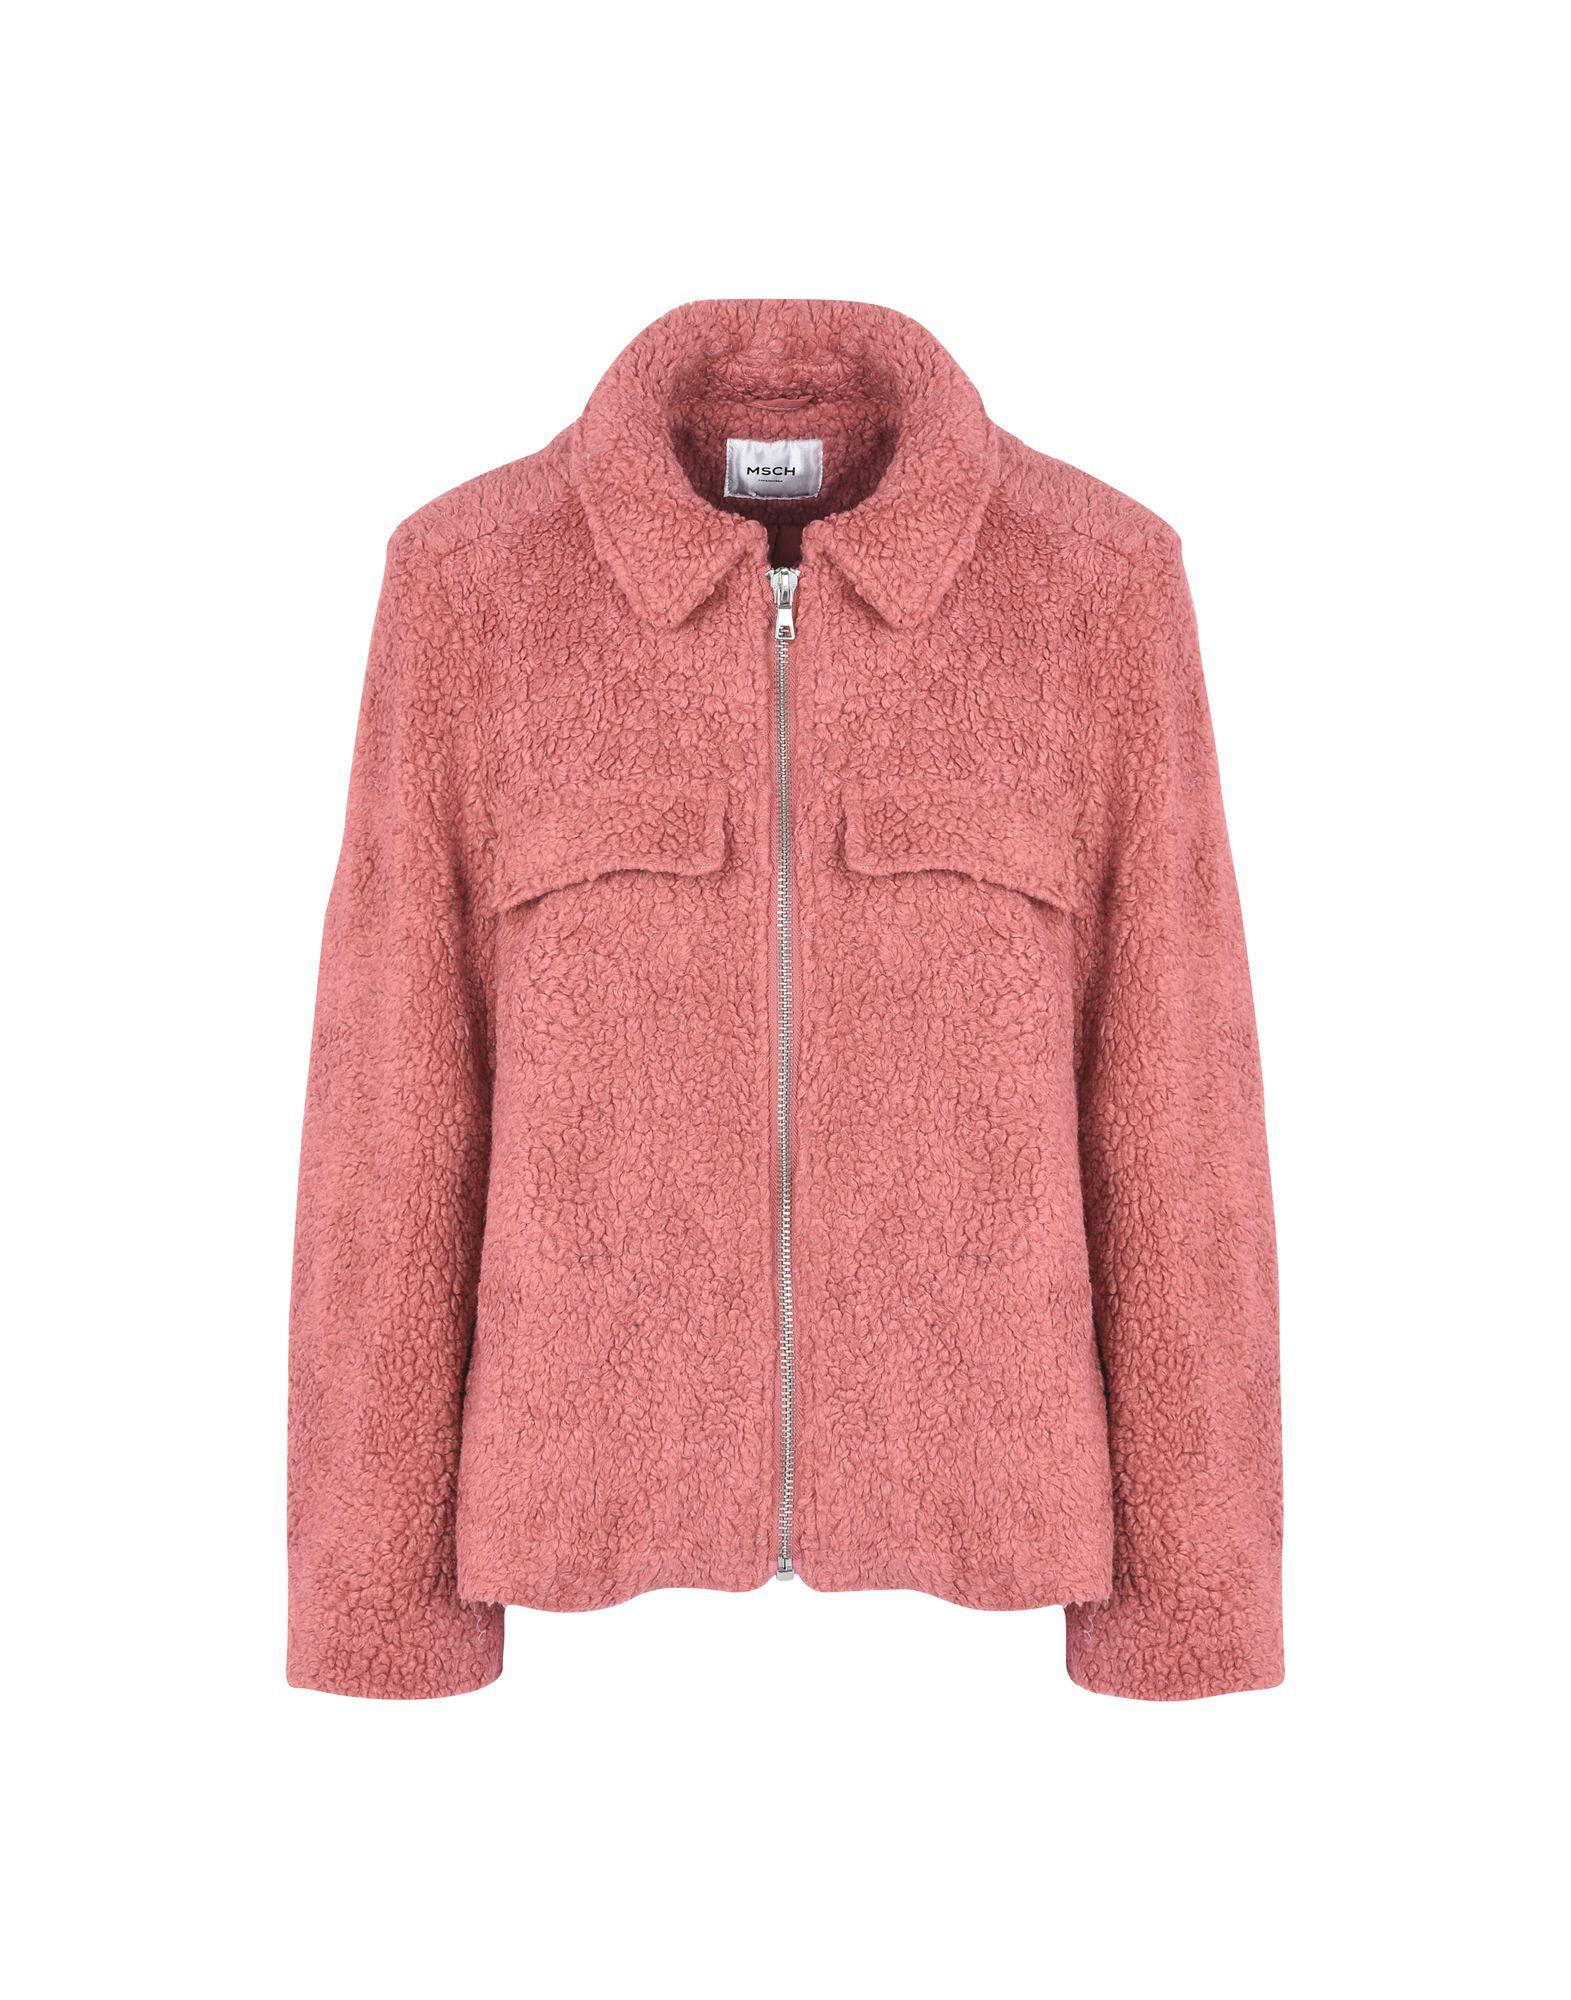 Copenhagen Acquista Teddy Alira Giubbotto Jacket Donna Moss qp6PB